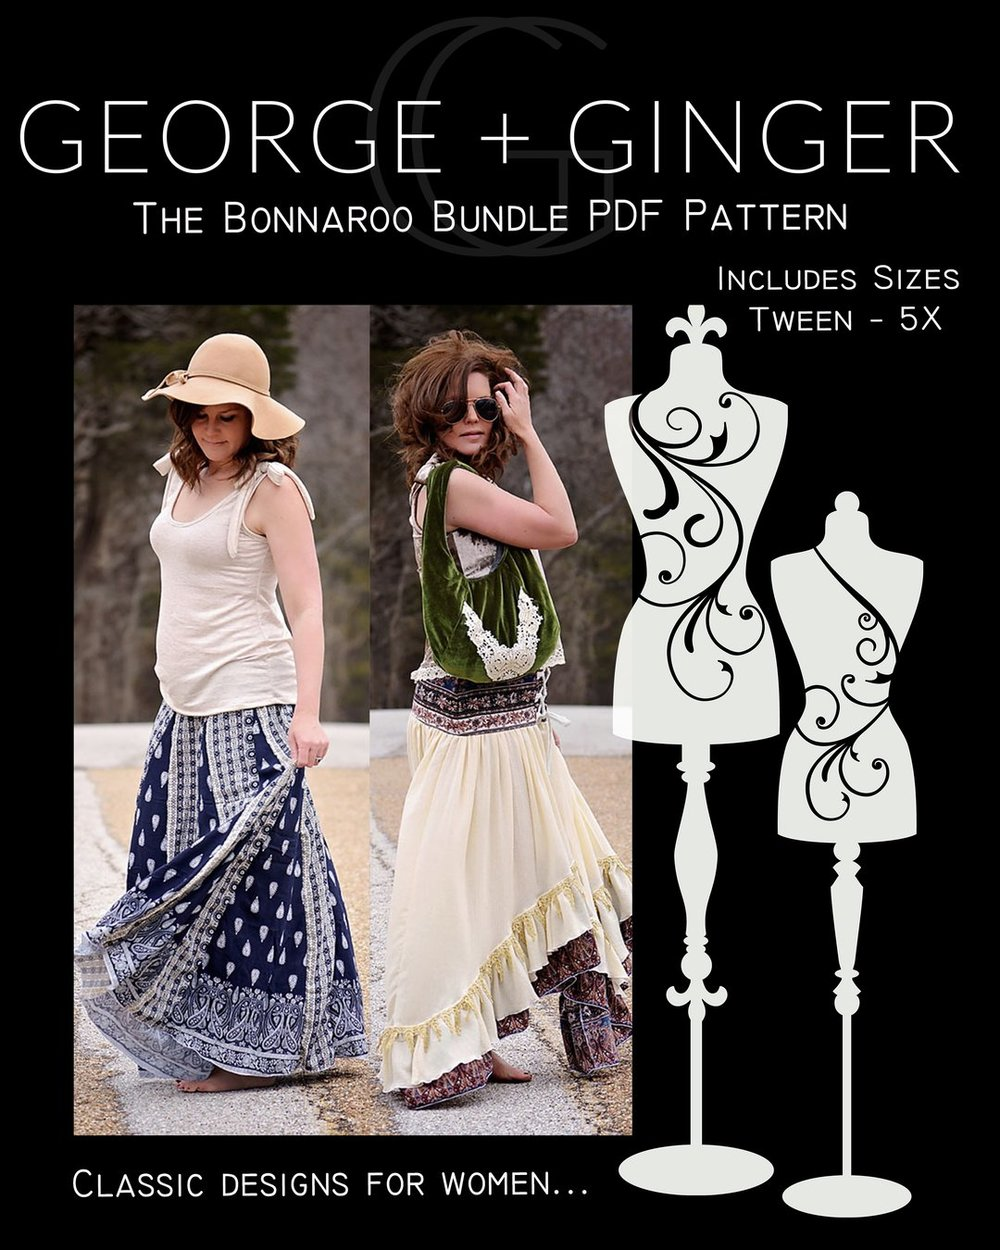 Bonnaroo bundle from George +Ginger